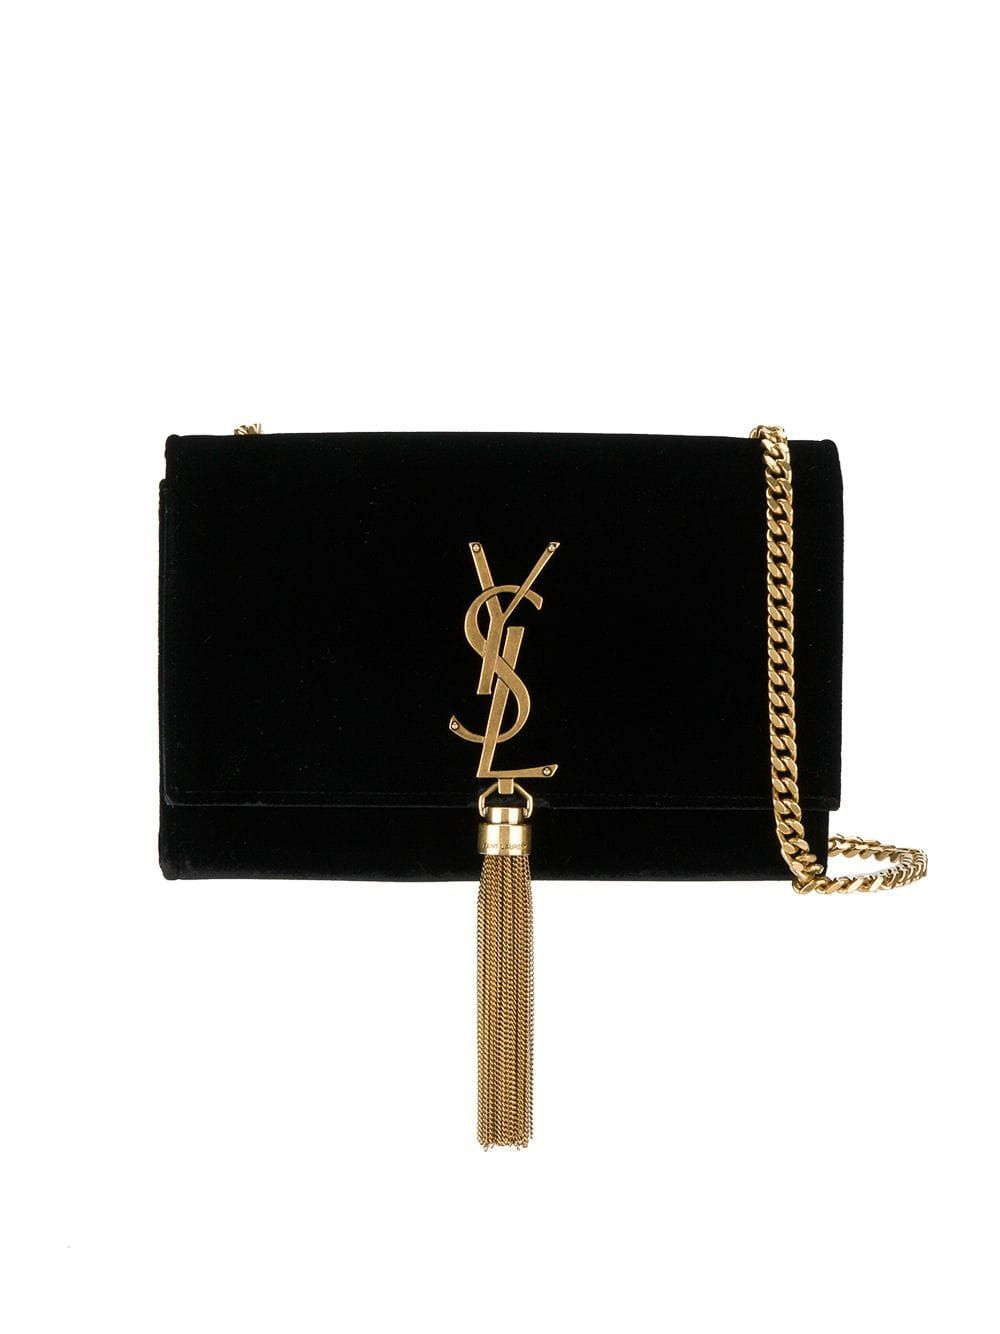 Saint Laurent - Classic Monogram Kate Medium Bag - Blush